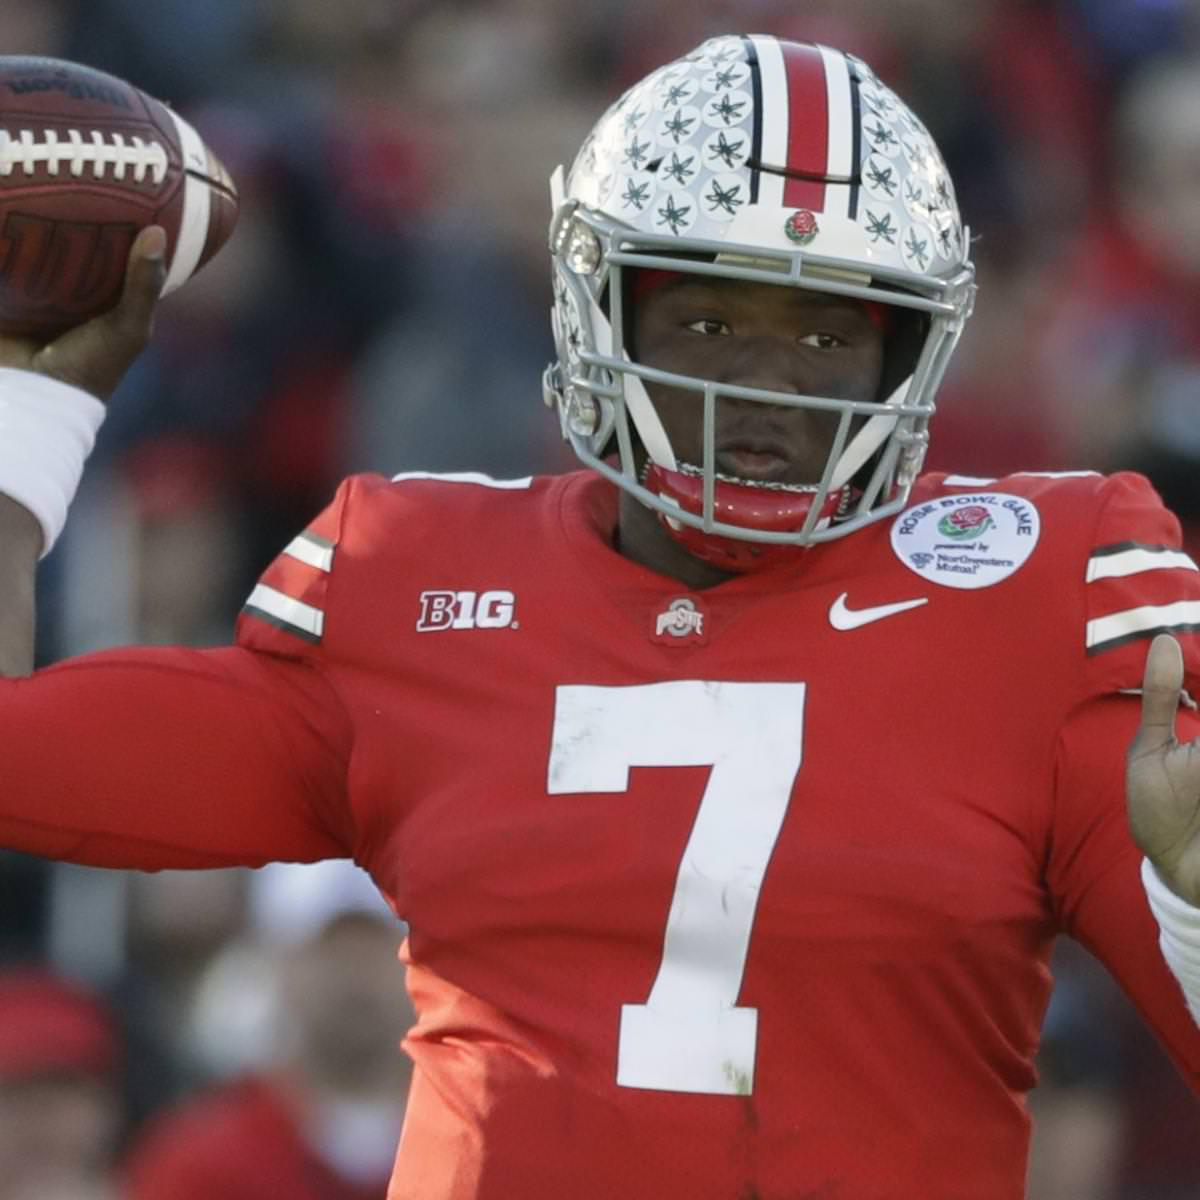 Projetado 1ª rodada Pick Dwayne Haskins deverá ser lançado em 2019 NFL Combin